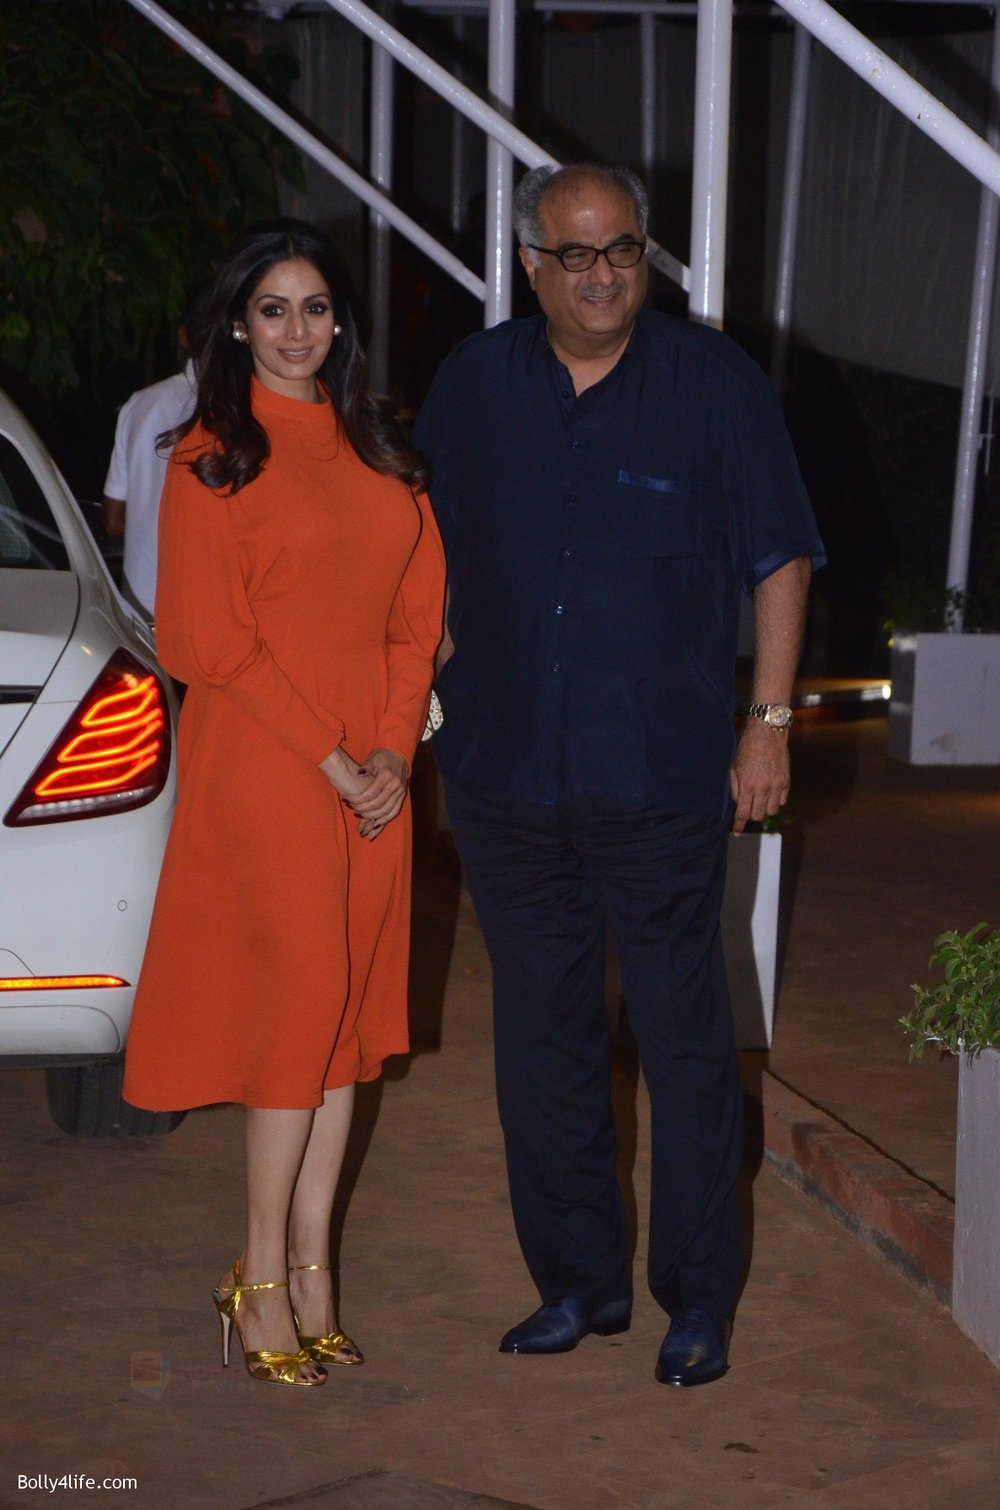 Boney-Kapoor-Sridevi-at-Reema-jain-bday-party-in-Amadeus-NCPA-on-28th-Sept-2016-1041.jpg